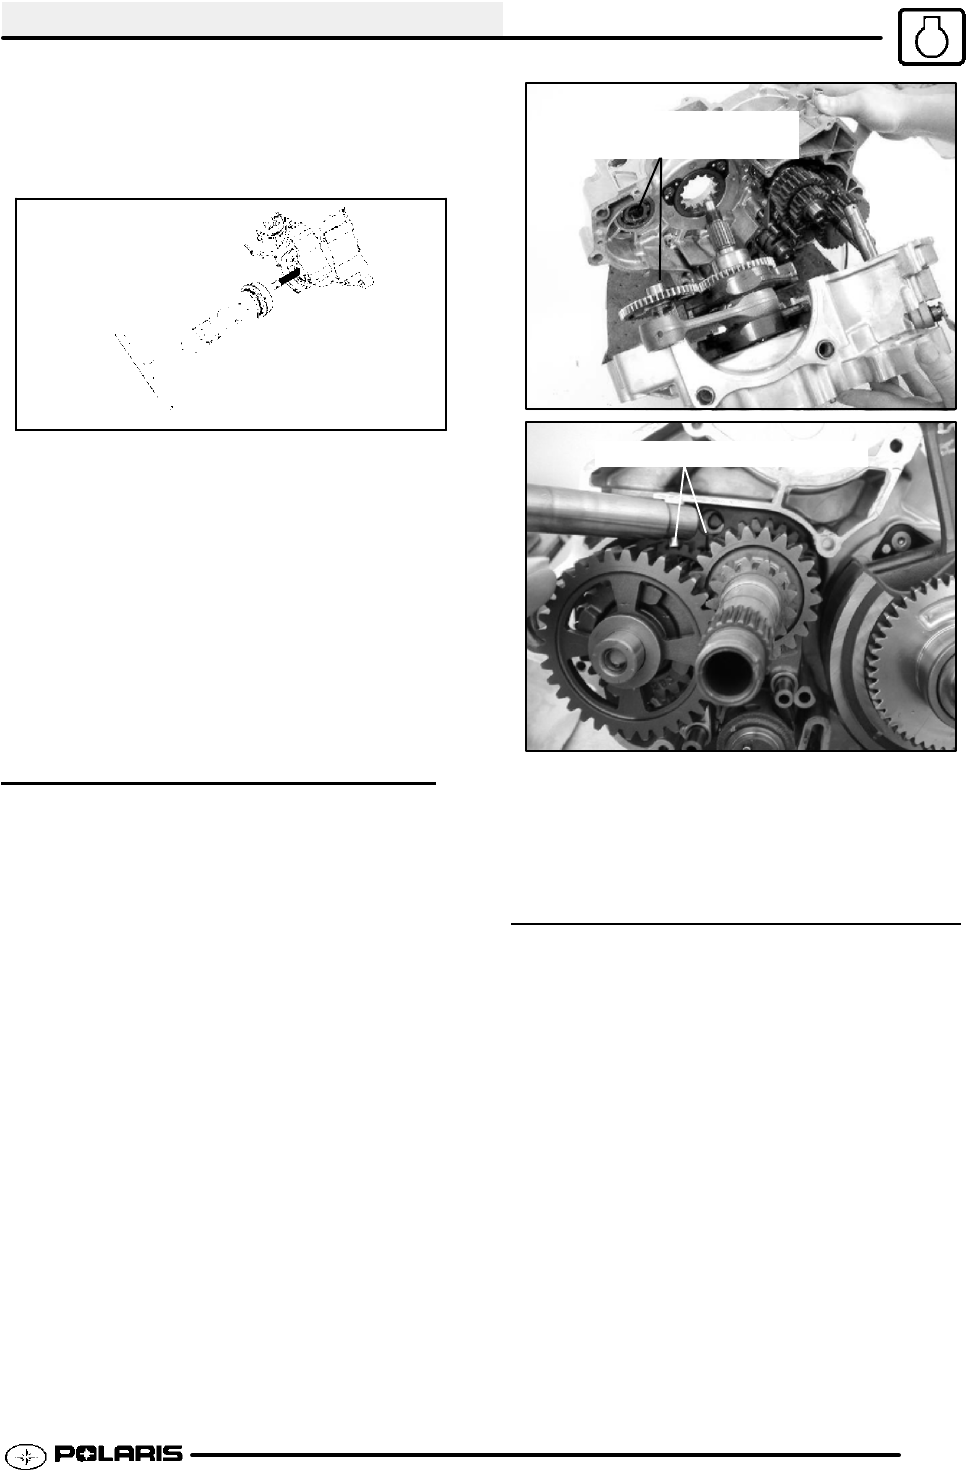 2003 Polaris Predator 500 Service Manual